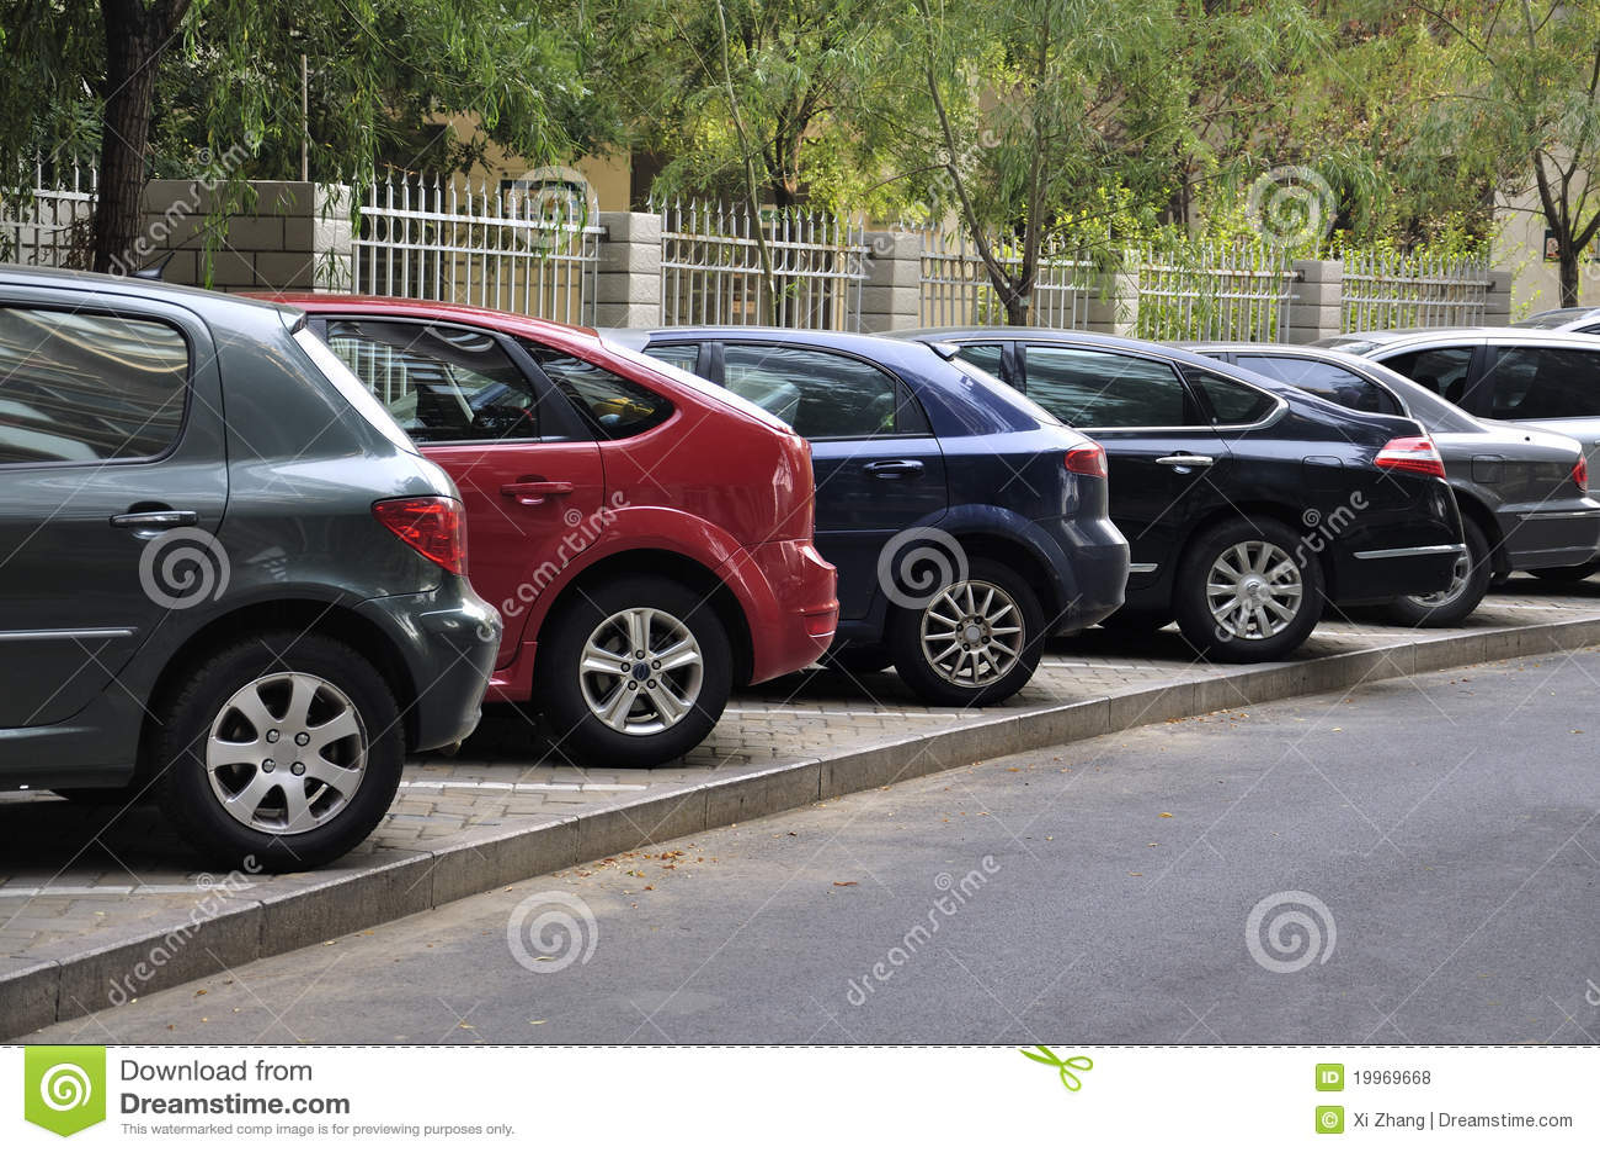 Parking lot cars